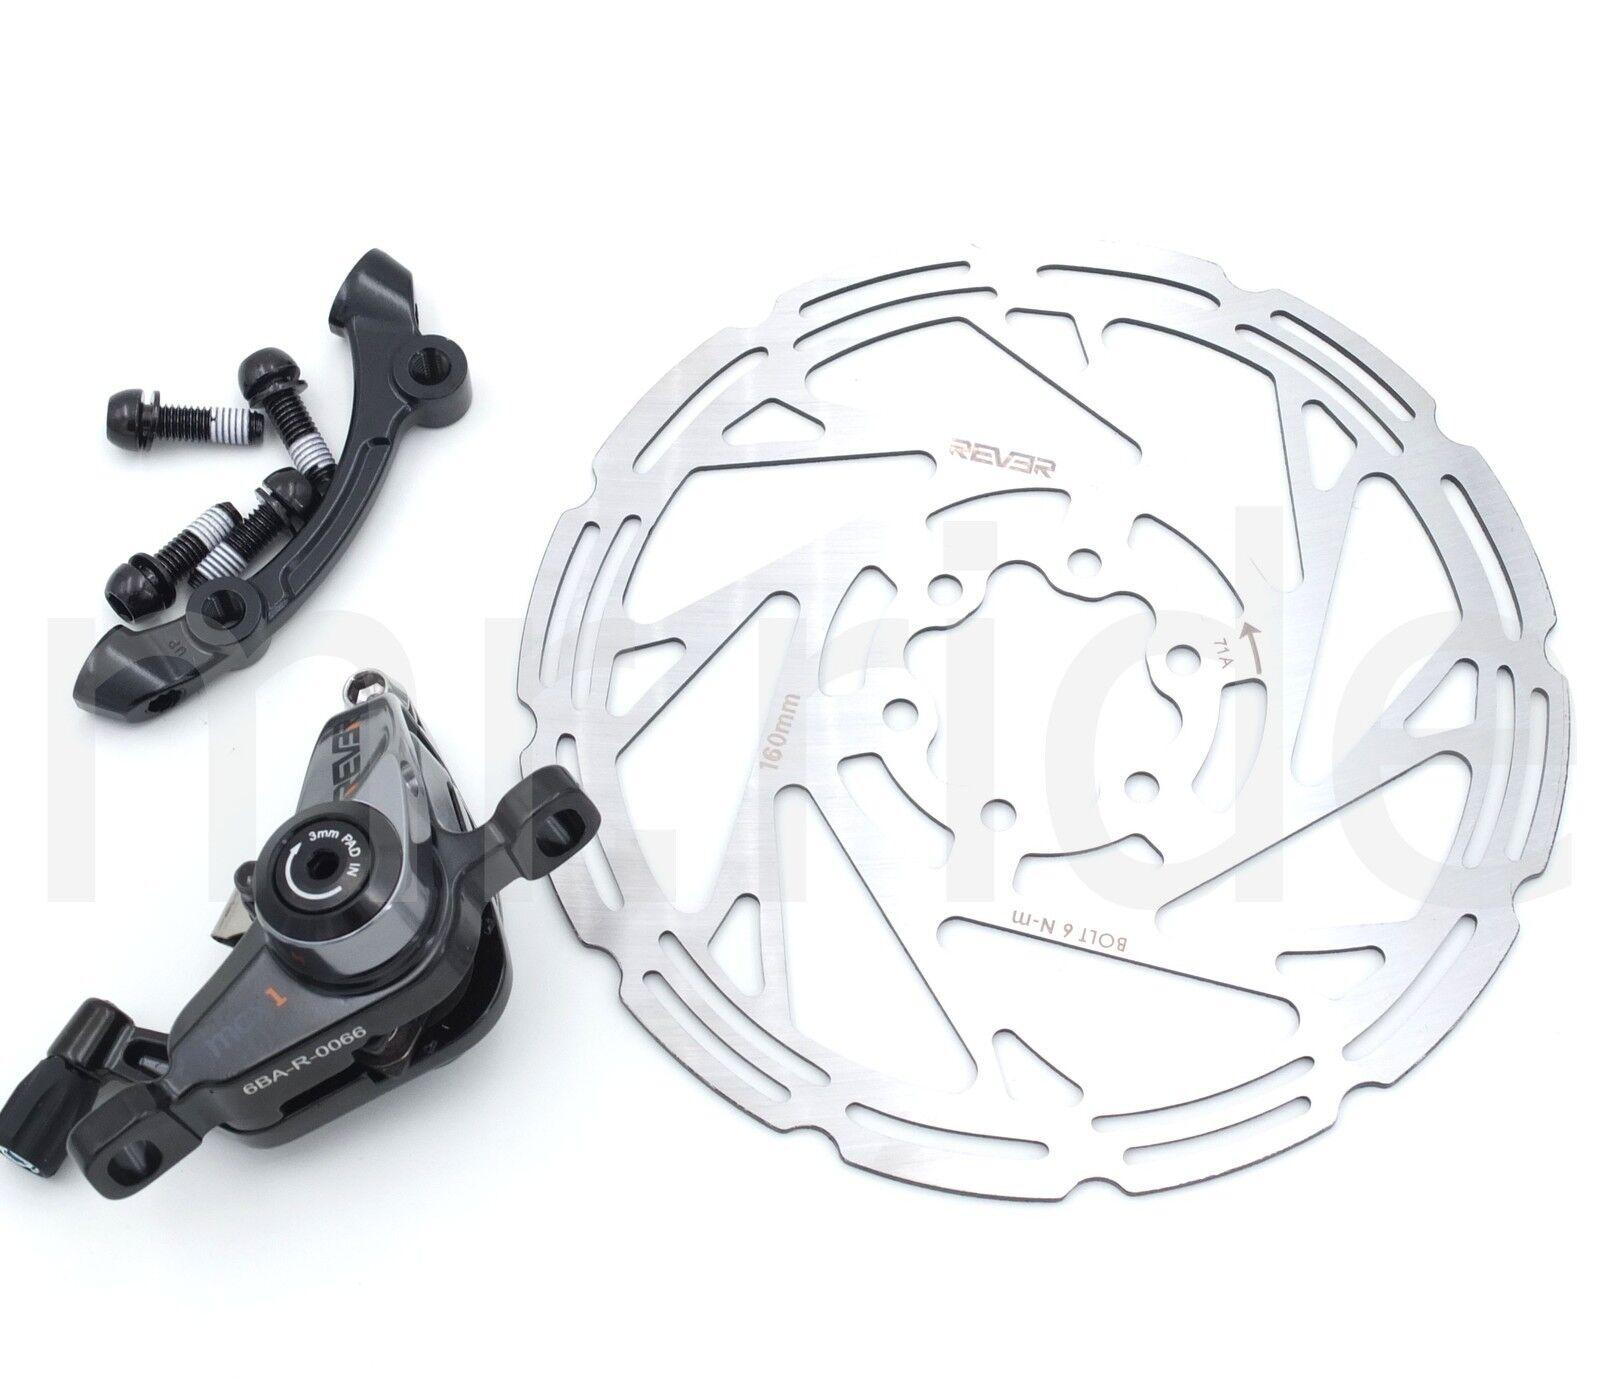 Rever Mechanical Bike CX Rear 160mm Disc Brake Caliper W  redor, IS adapter